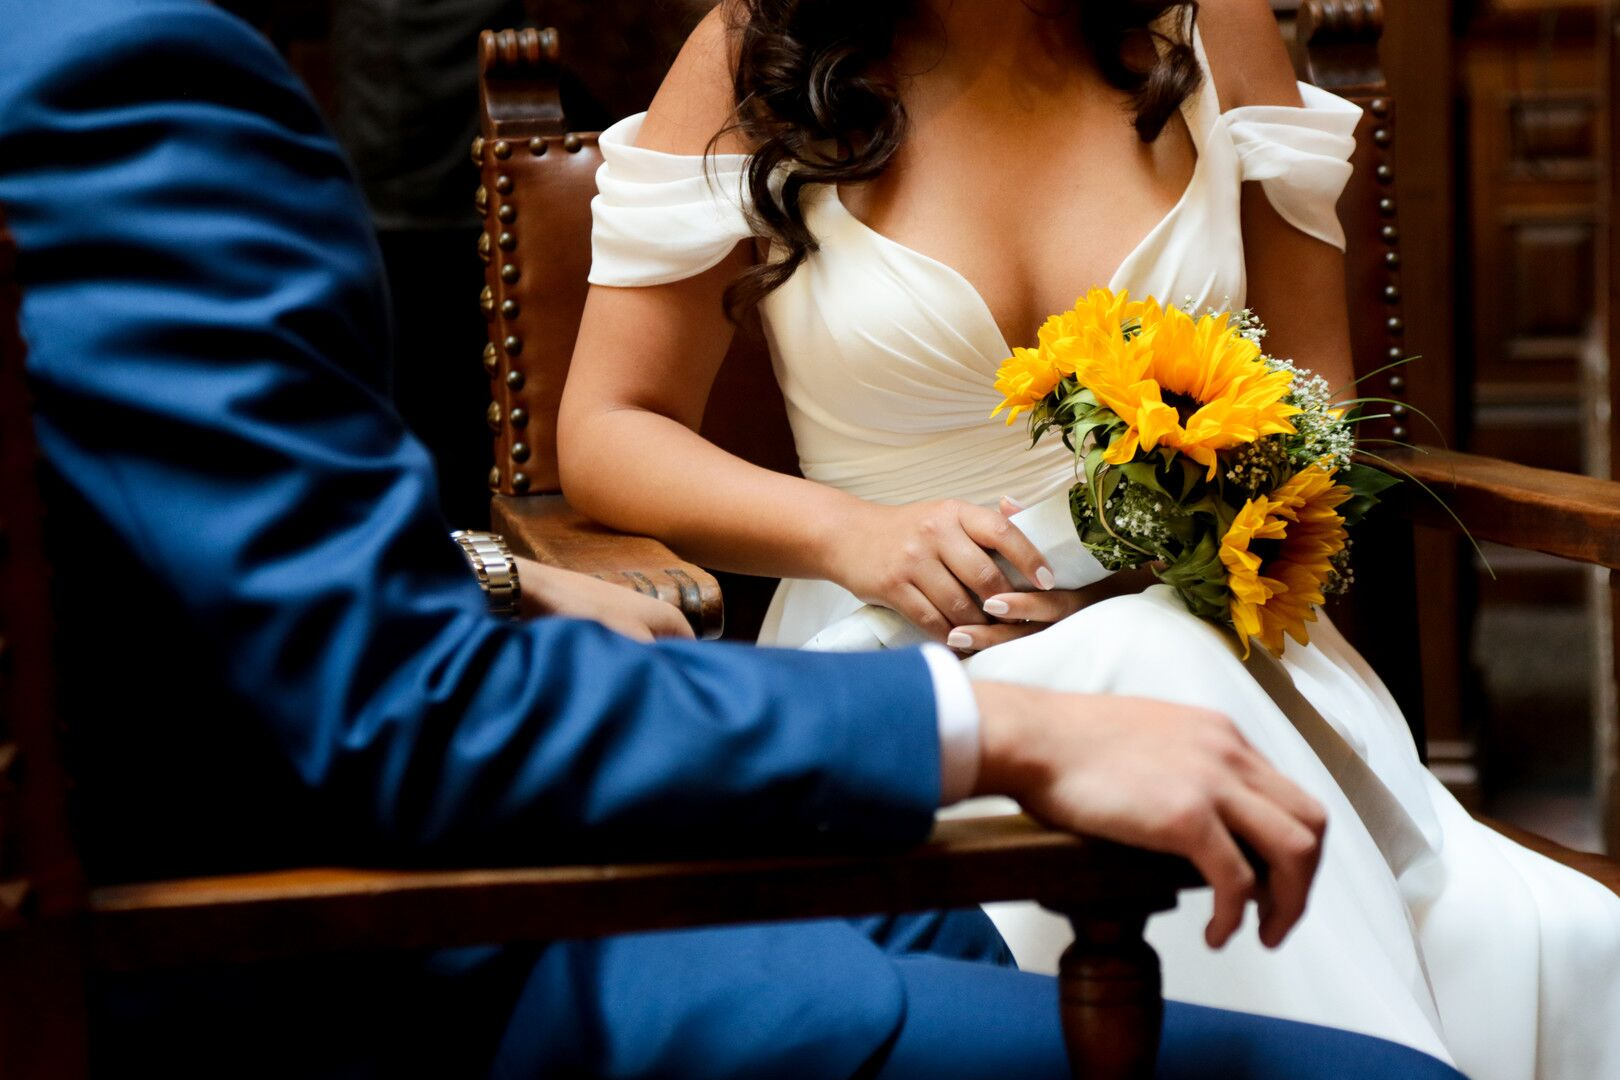 www.santabarbaraweddings.com | Photographer: Trista Maja Photography | Venue: Santa Barbara Courthouse | Wedding Dress: Lulus | Hair: Legends Hair | Couple Clothing and Bridal Bouquet